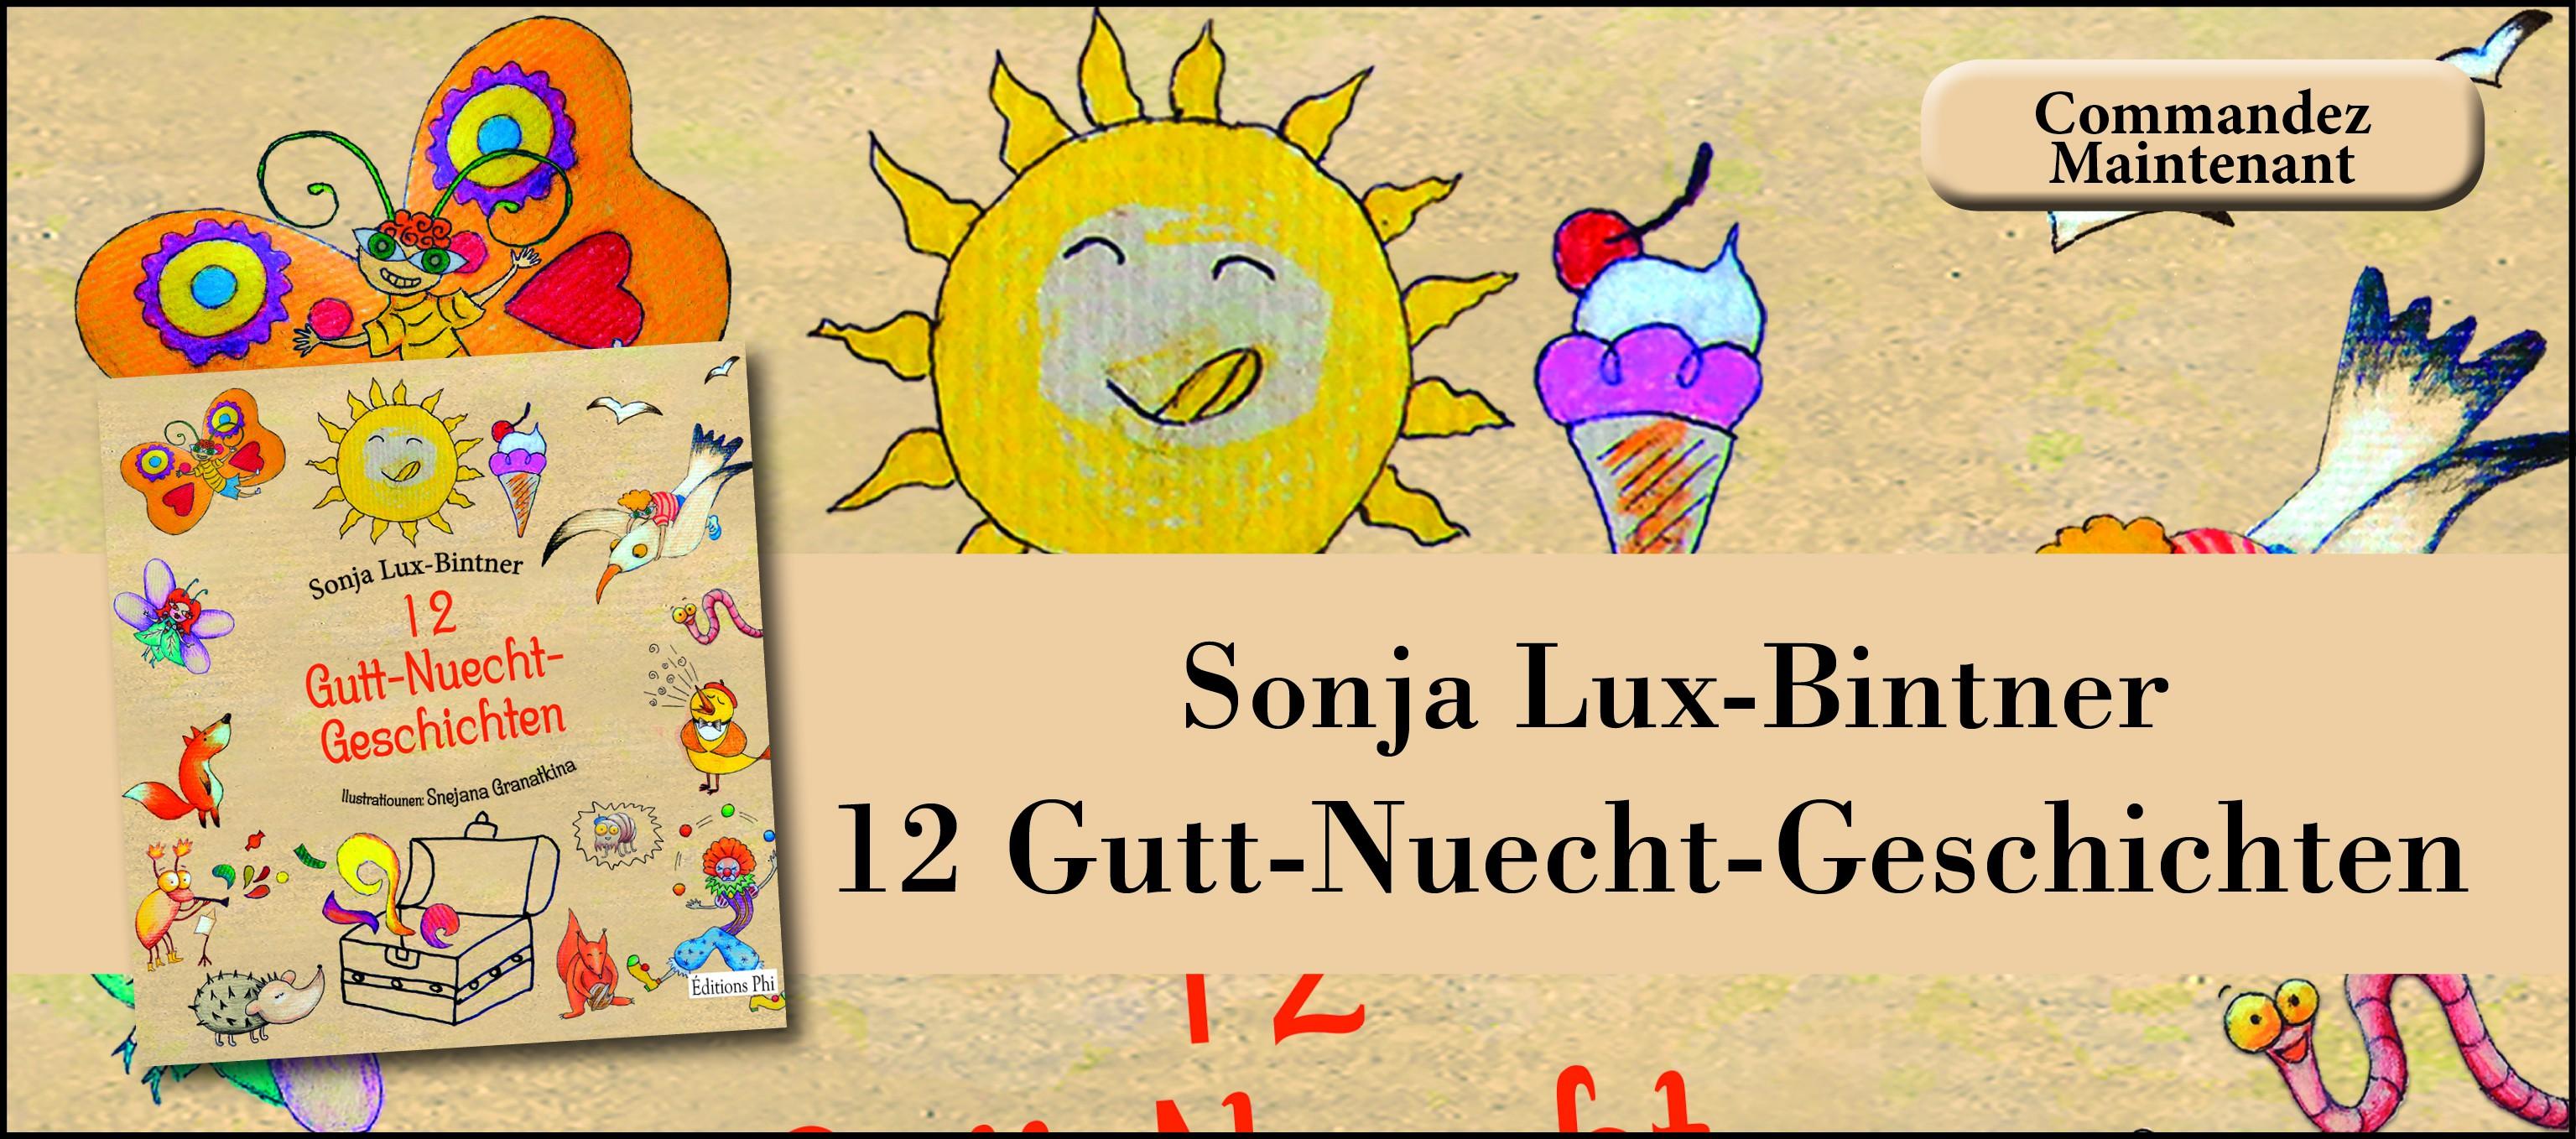 Sonja Lux-Bintner: 12-Gutt-Nuecht-Geschichten